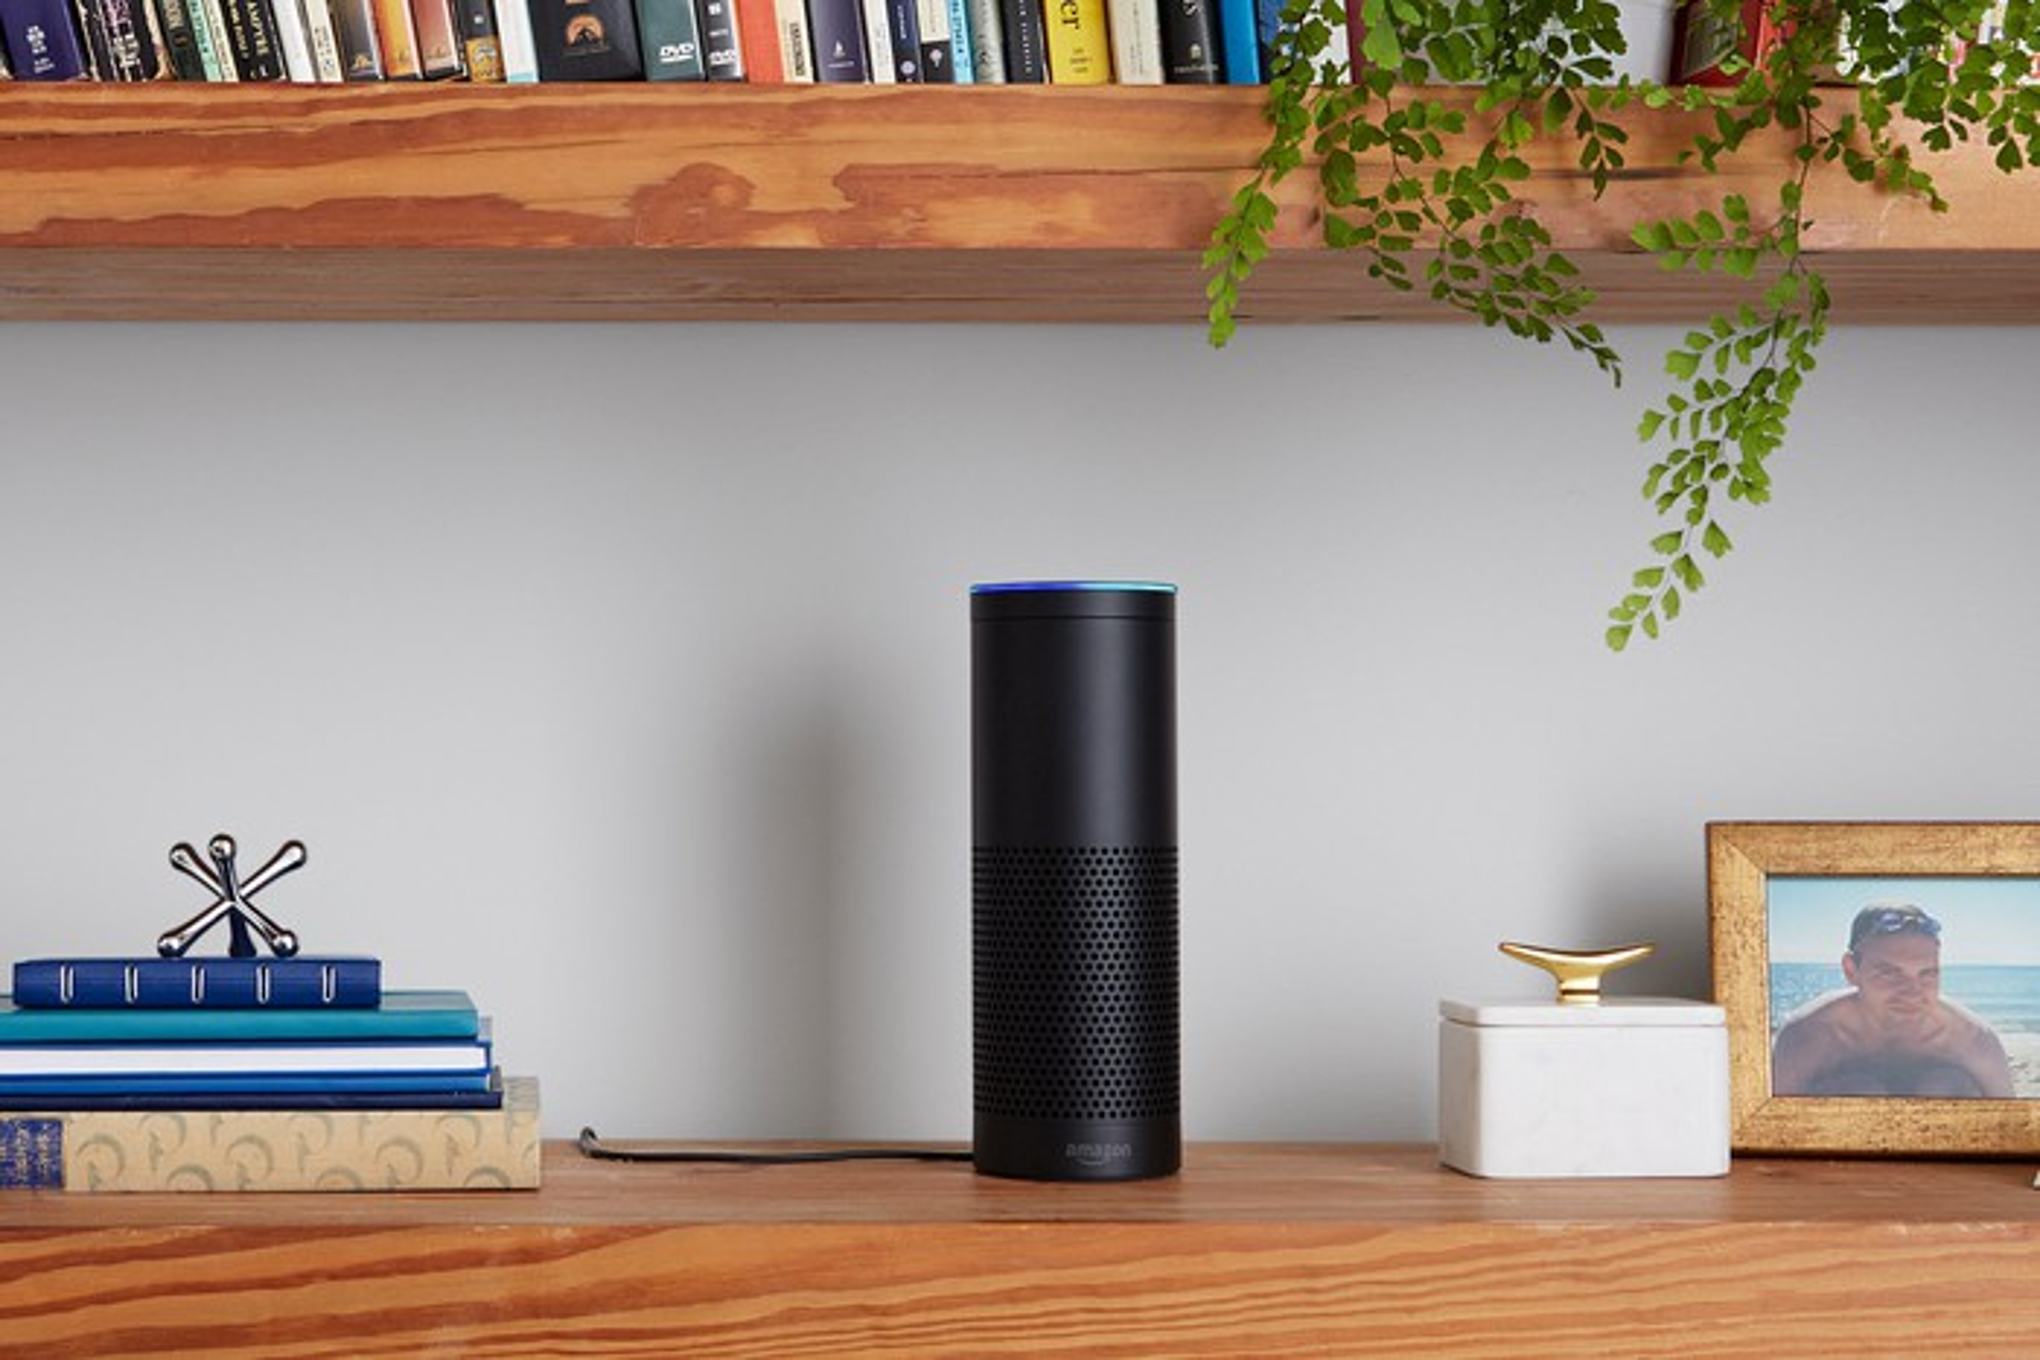 A black Amazon Echo smart speaker on a bookshelf.